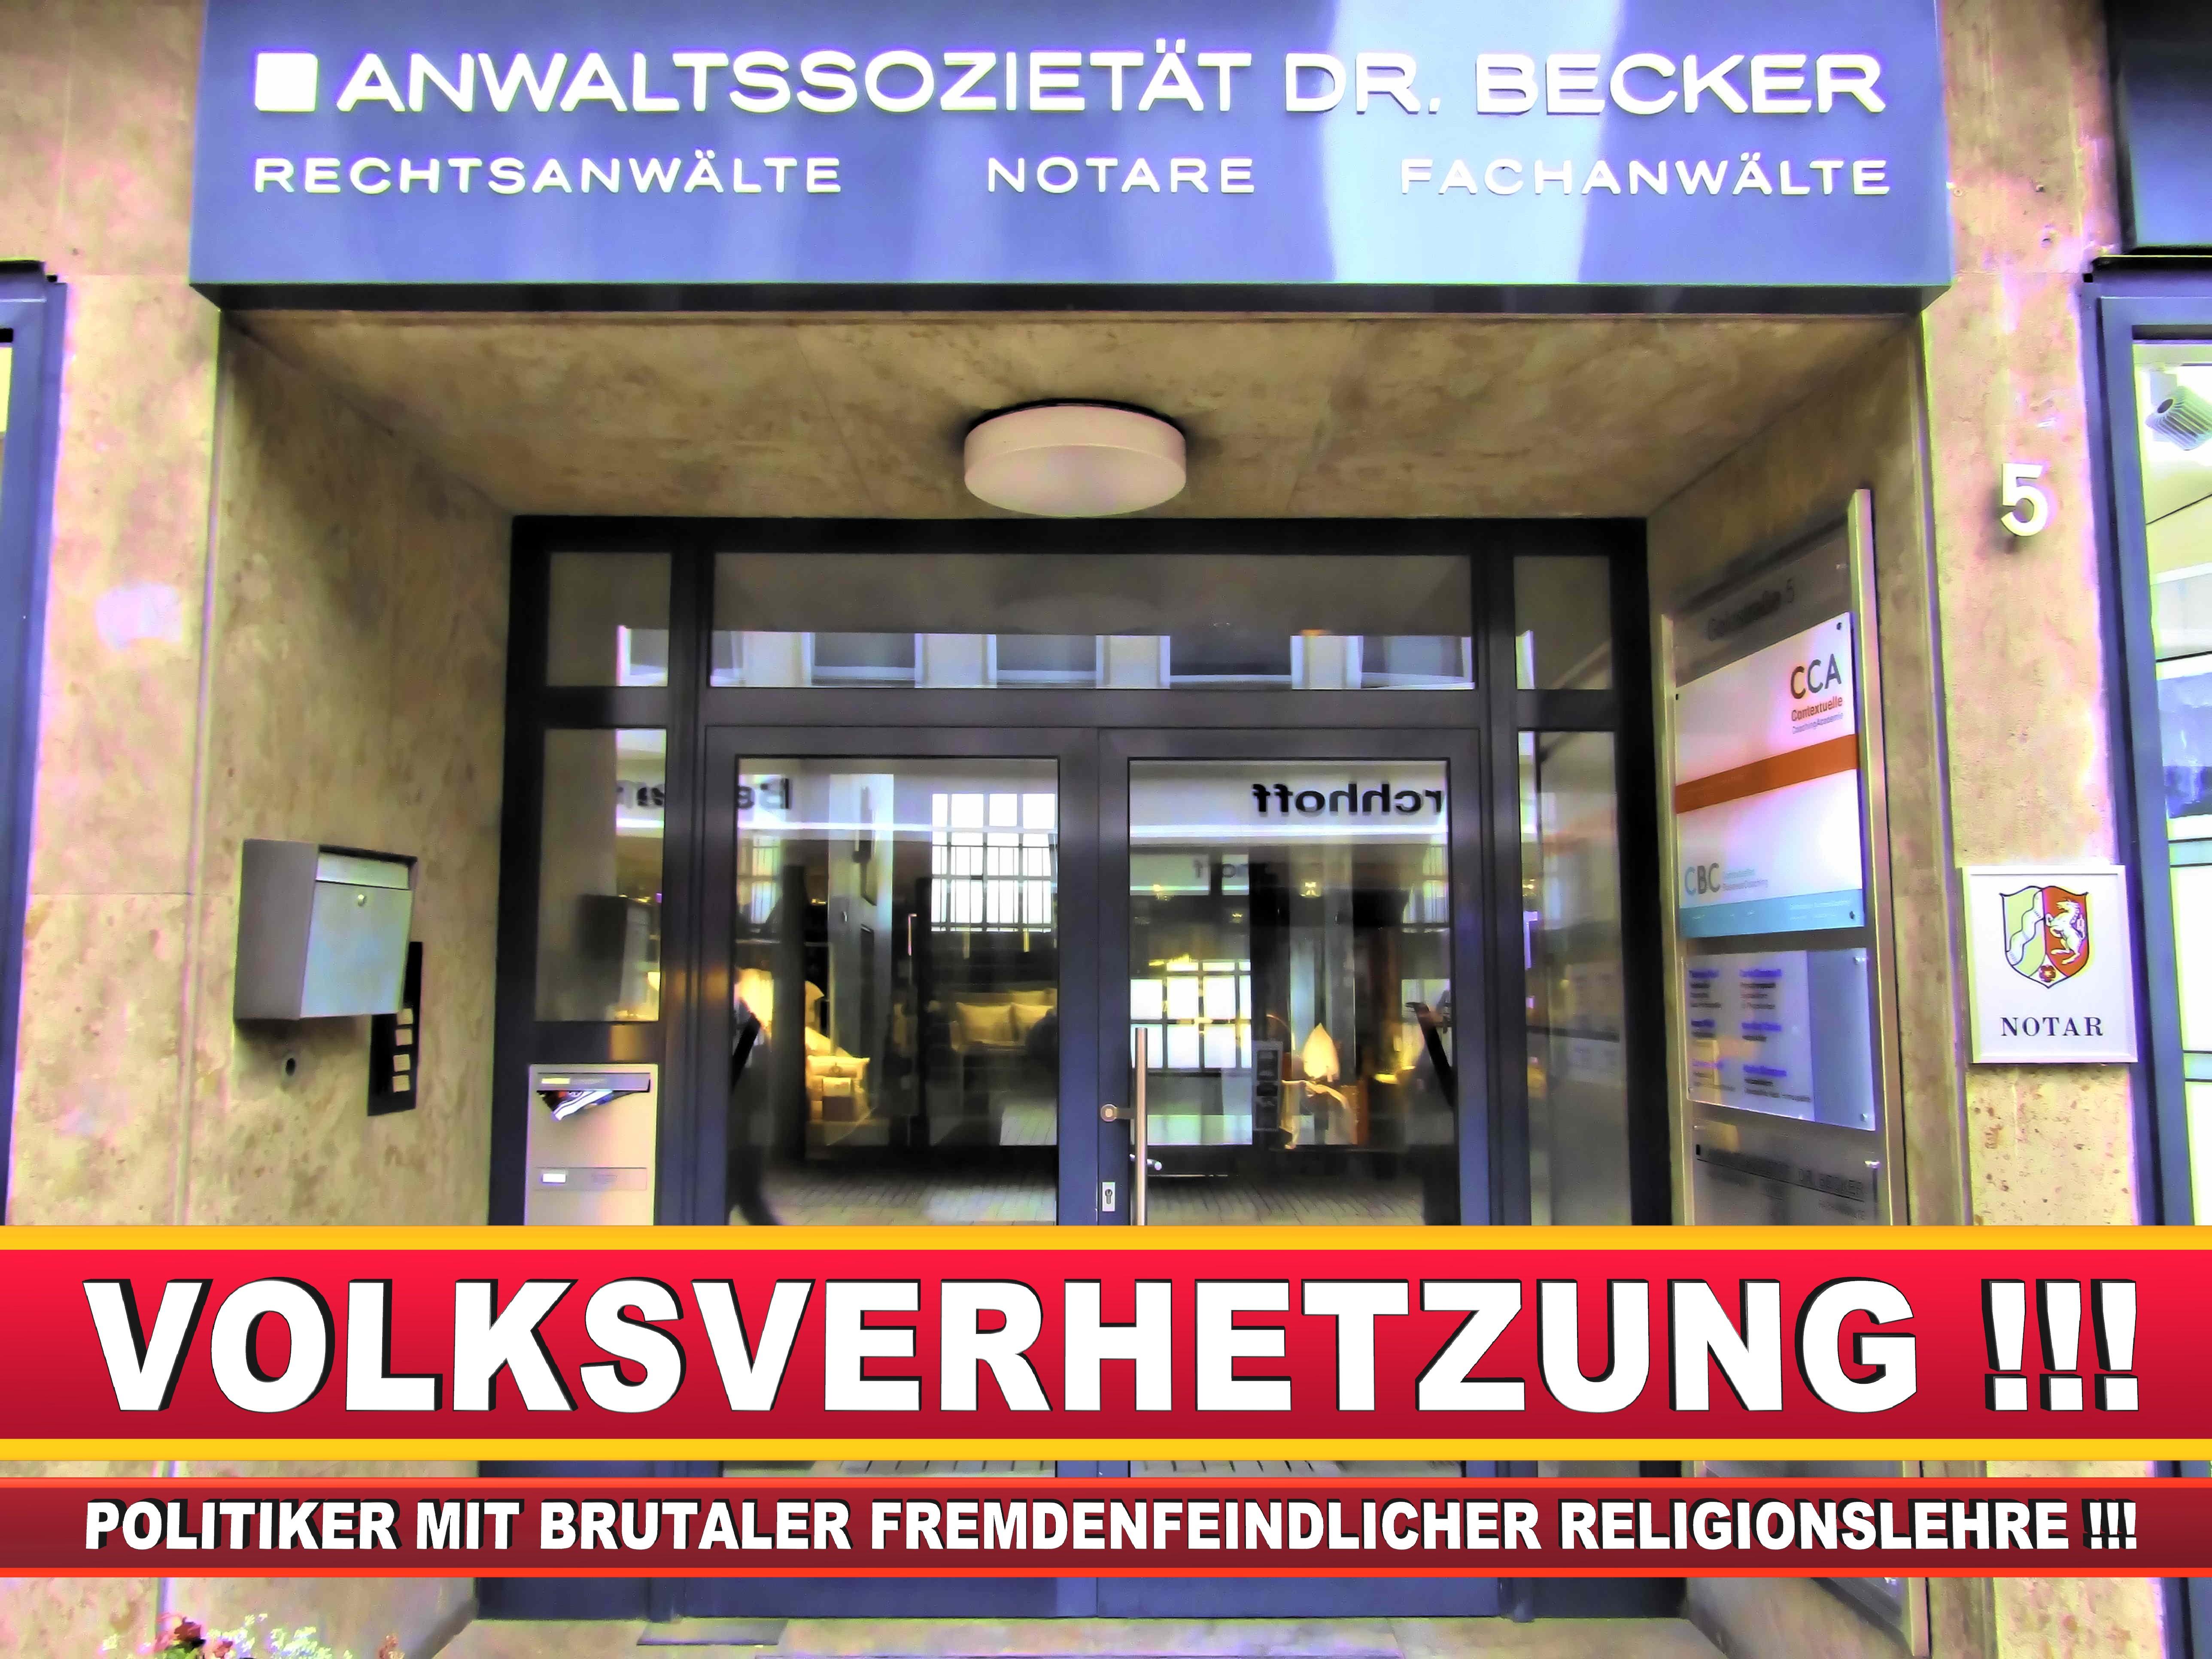 RECHTSANWALT DR THORSTEN FELDMANN CDU BIELEFELD RECHTSANWALT UND NOTAR A D WERNER KAUP LANDTAGSWAHL BUNDESTAGSWA L BÜRGERMEISTER AHL NRW (2)